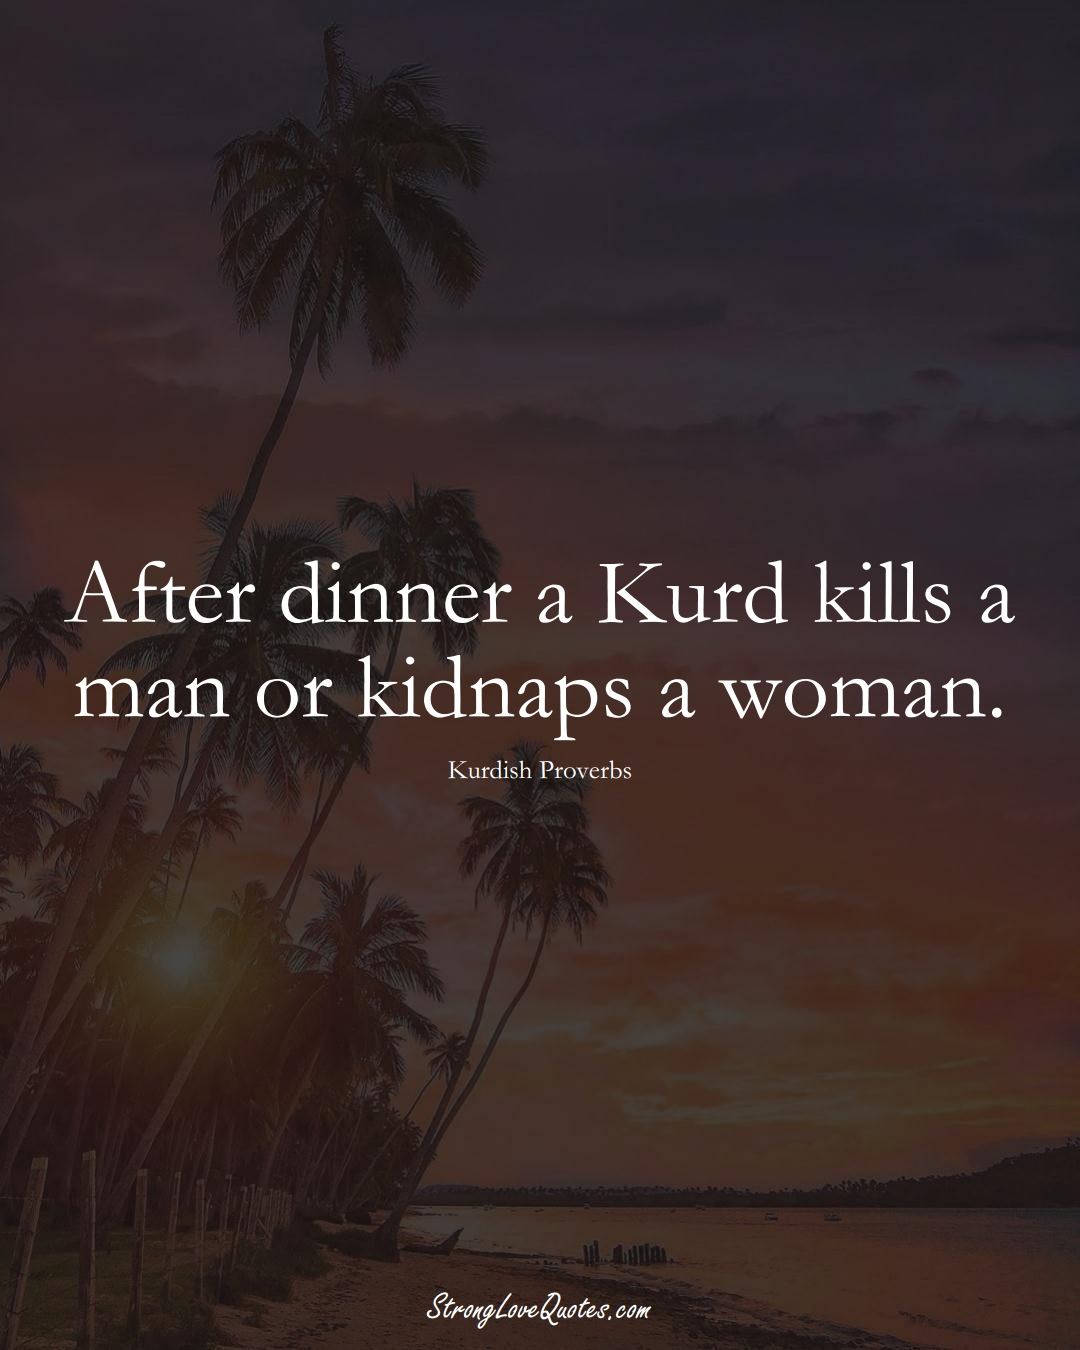 After dinner a Kurd kills a man or kidnaps a woman. (Kurdish Sayings);  #aVarietyofCulturesSayings